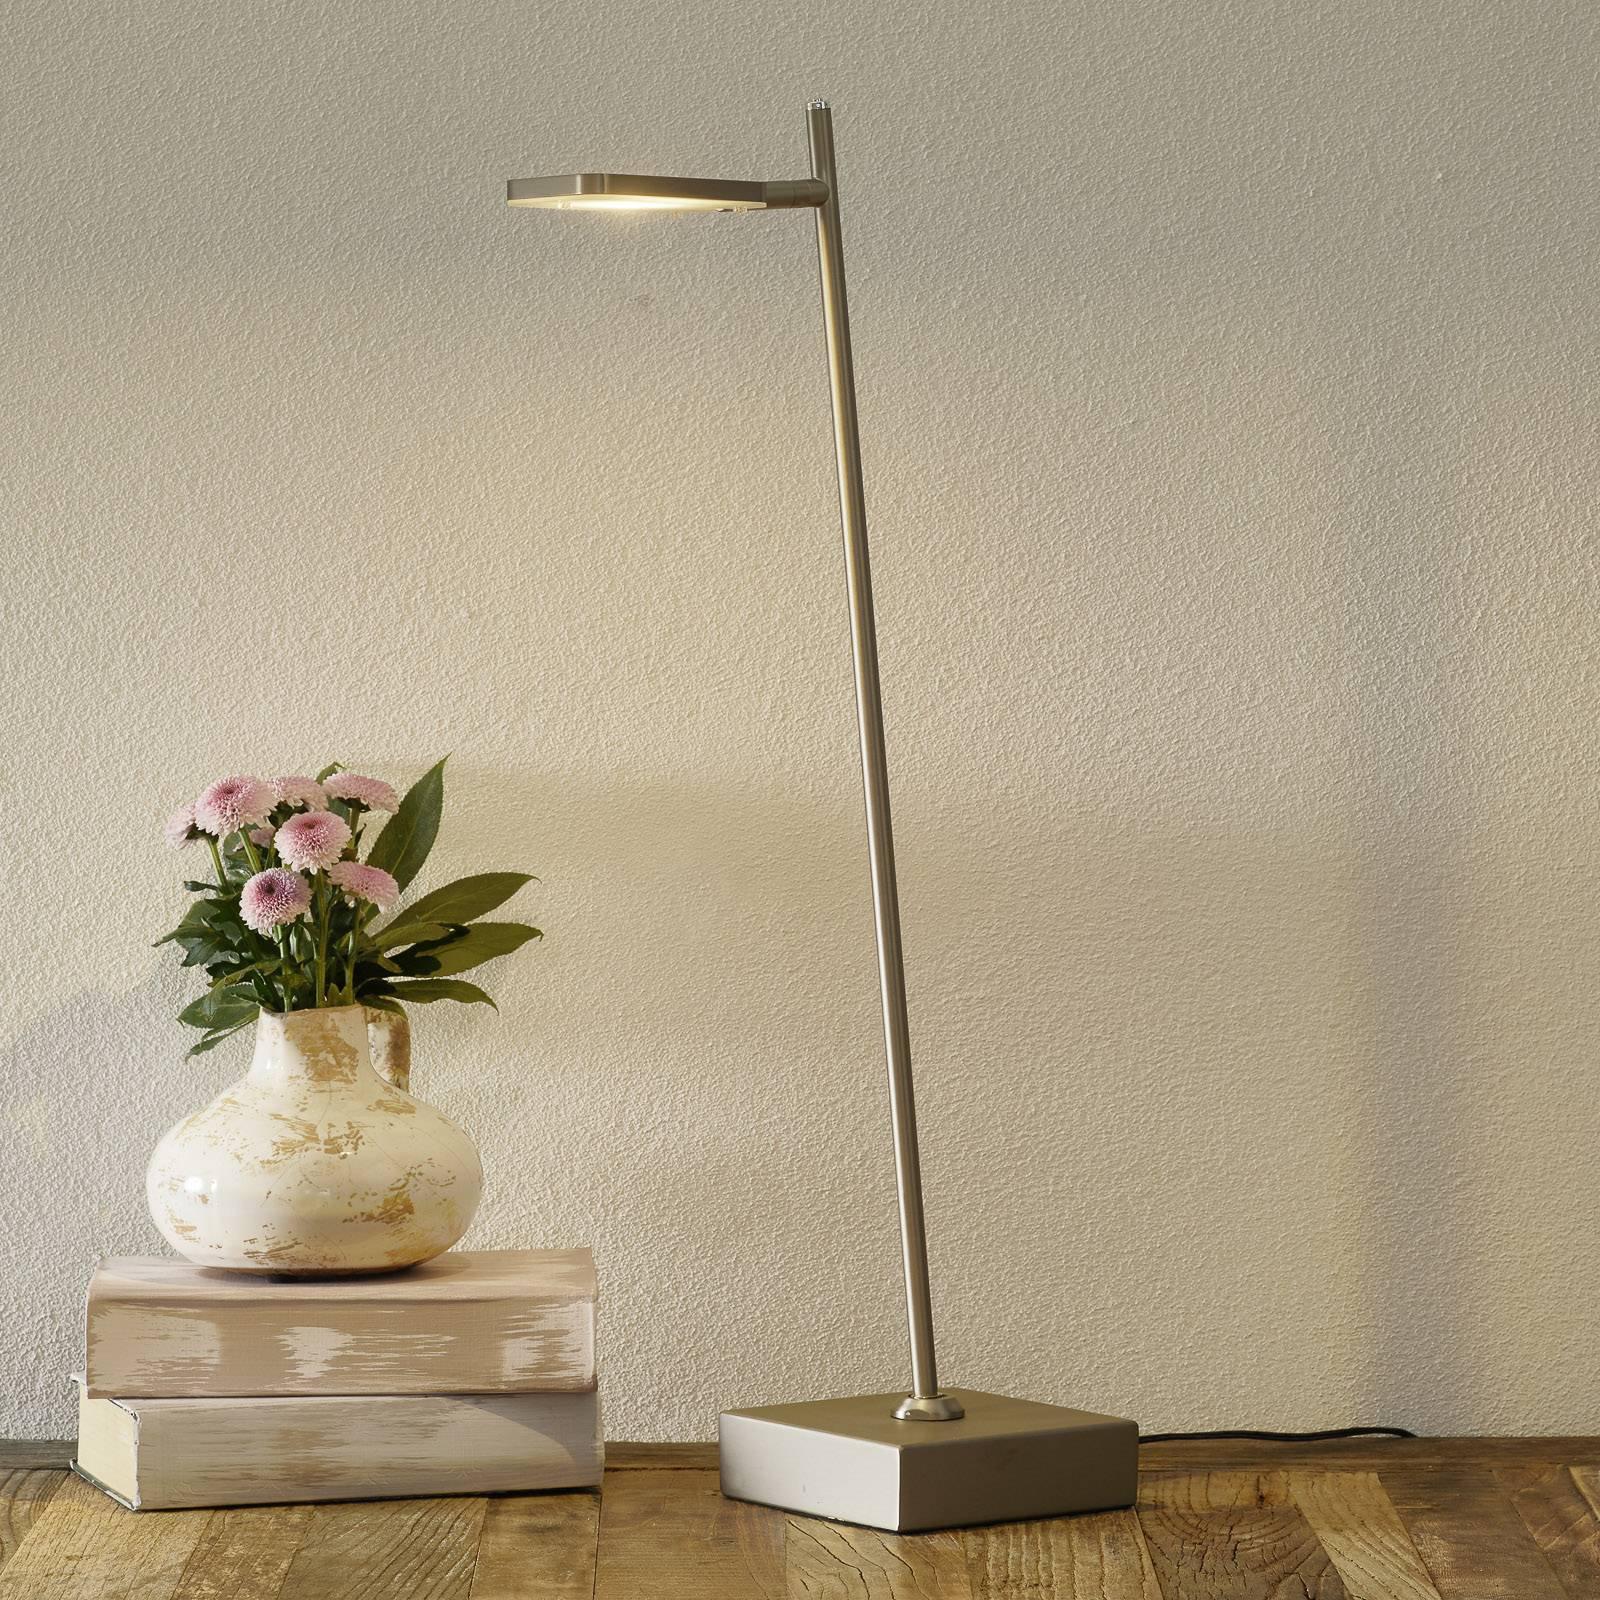 LED-bordlampe block, dimbar, stålfarget